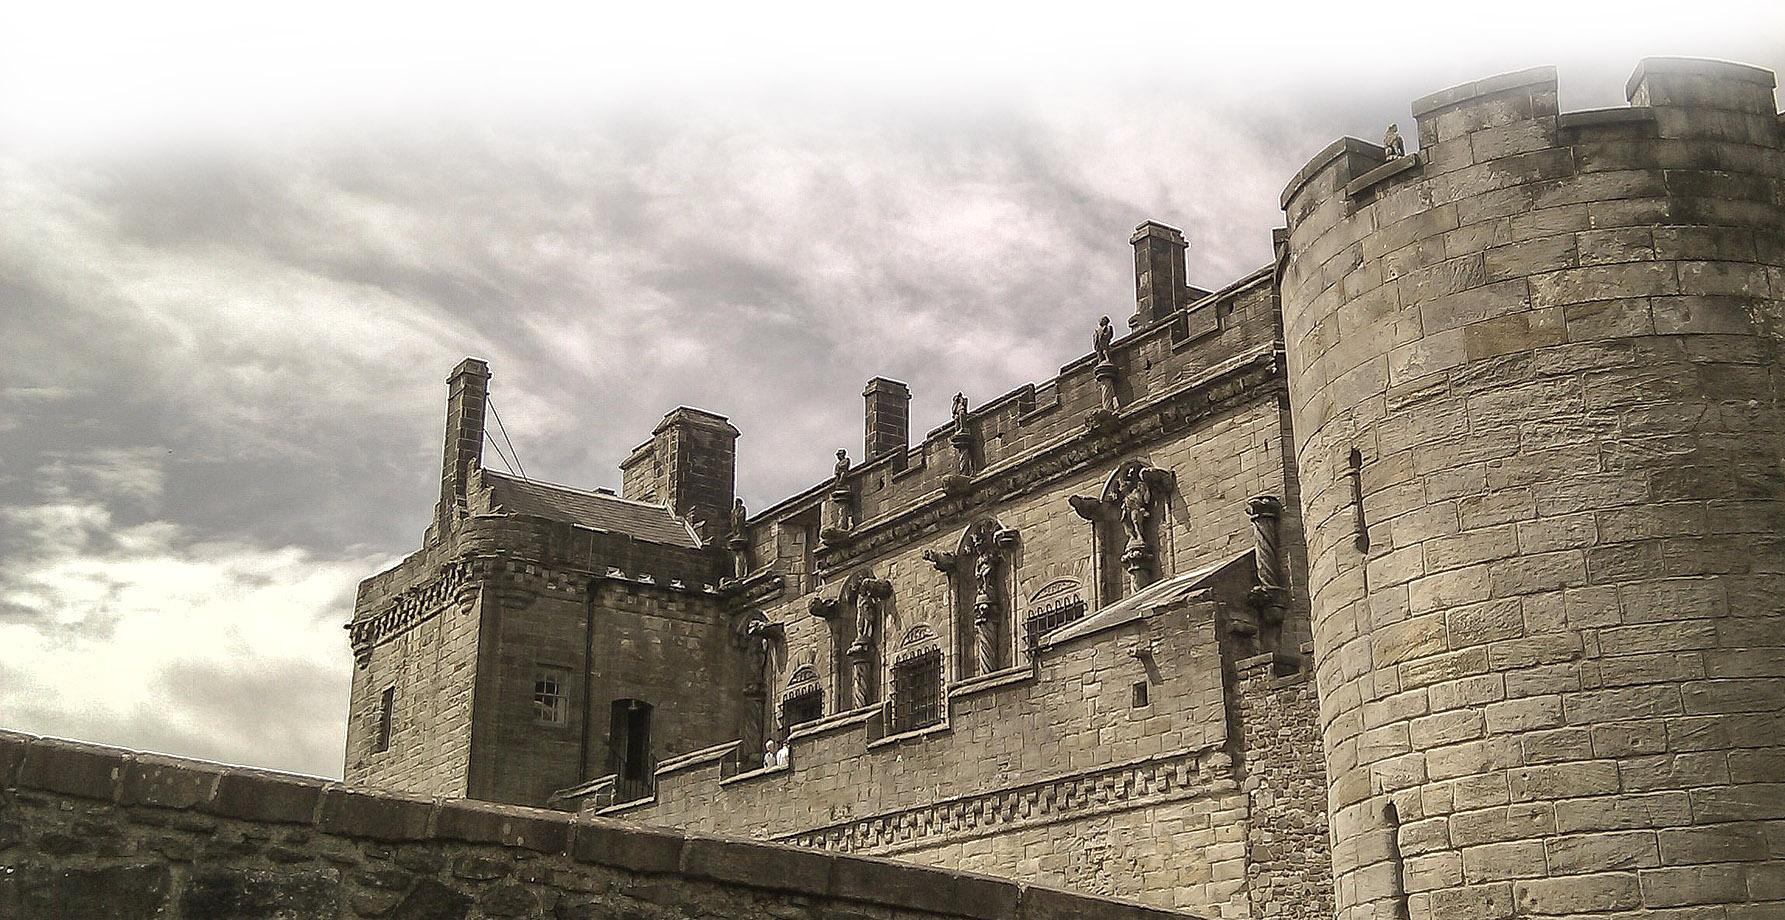 stirling-castle-202103_1920 copy_Pixabay